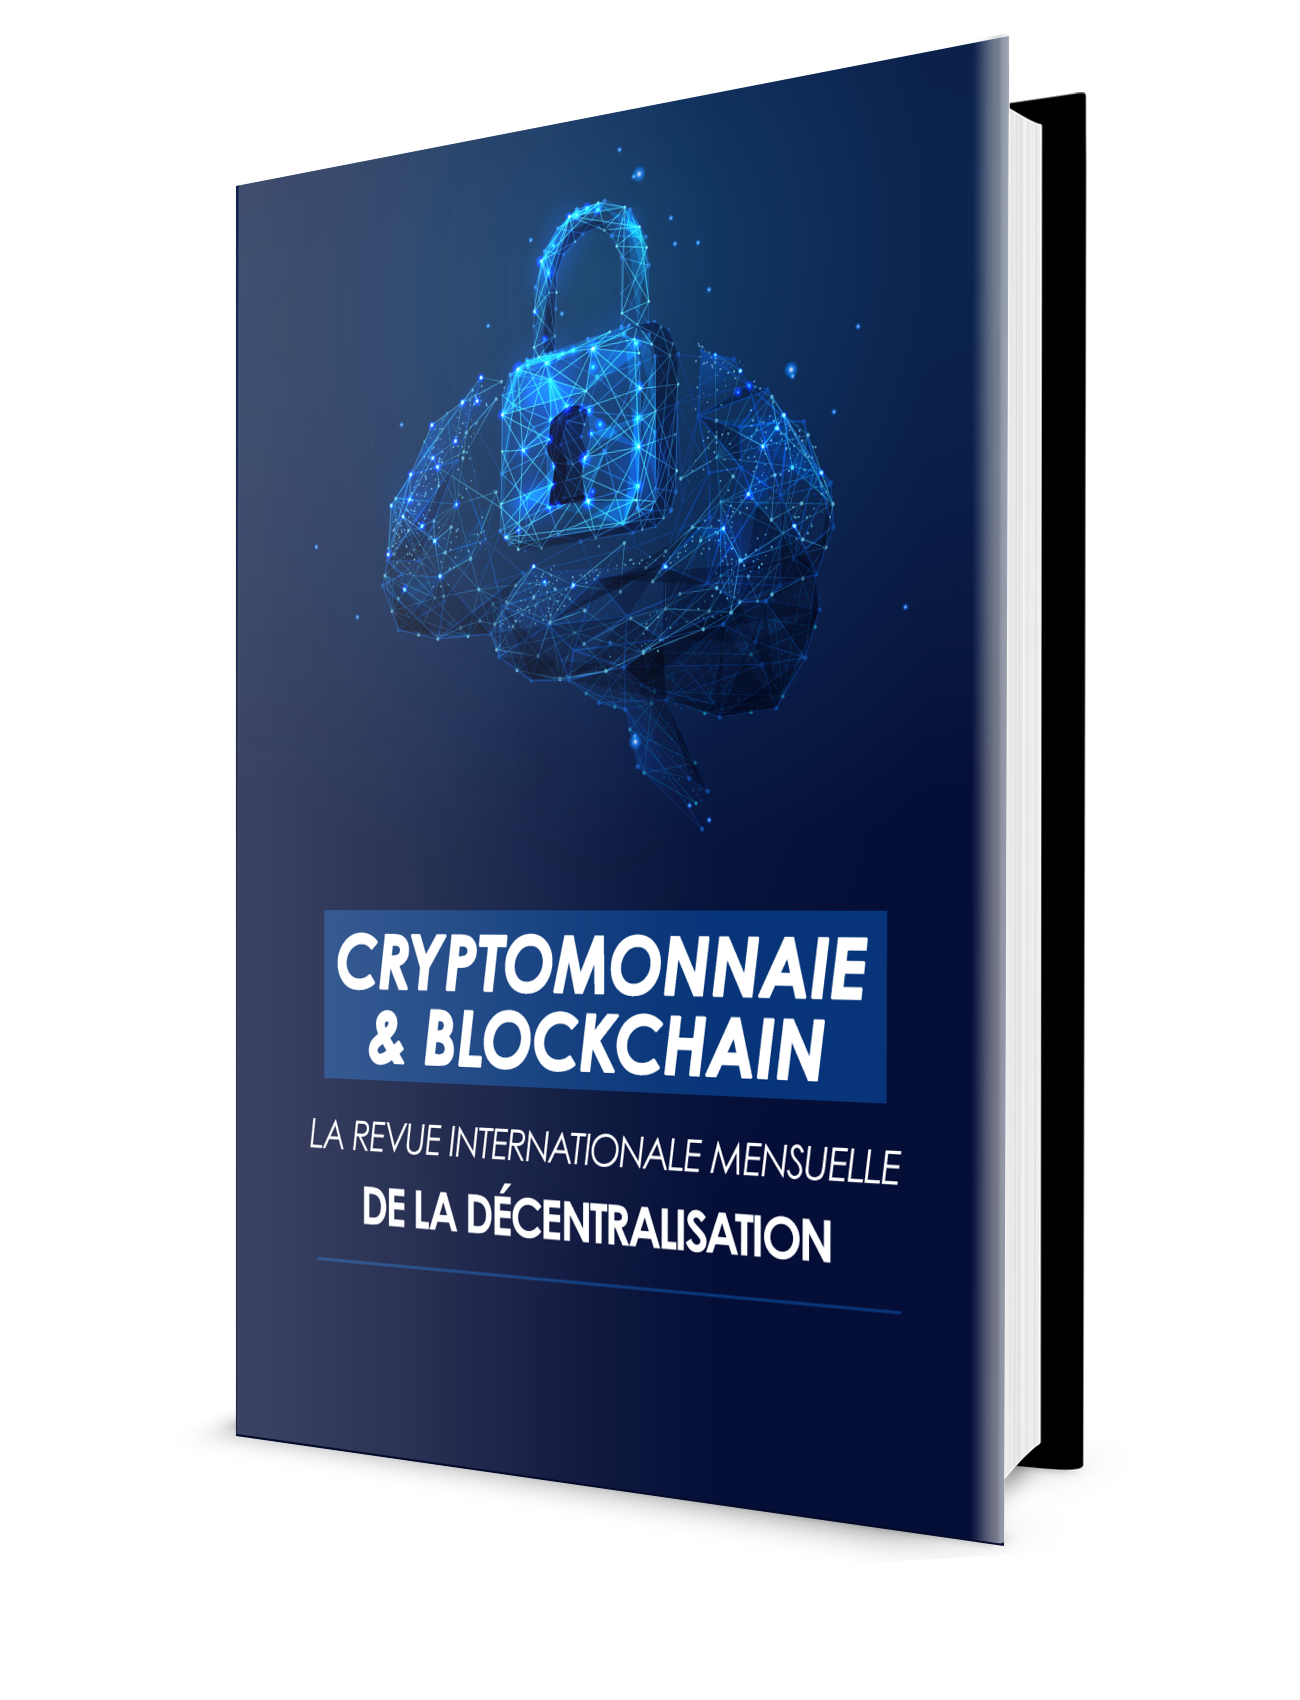 Cryptomonnaie & Blockchain : revue mensuelle